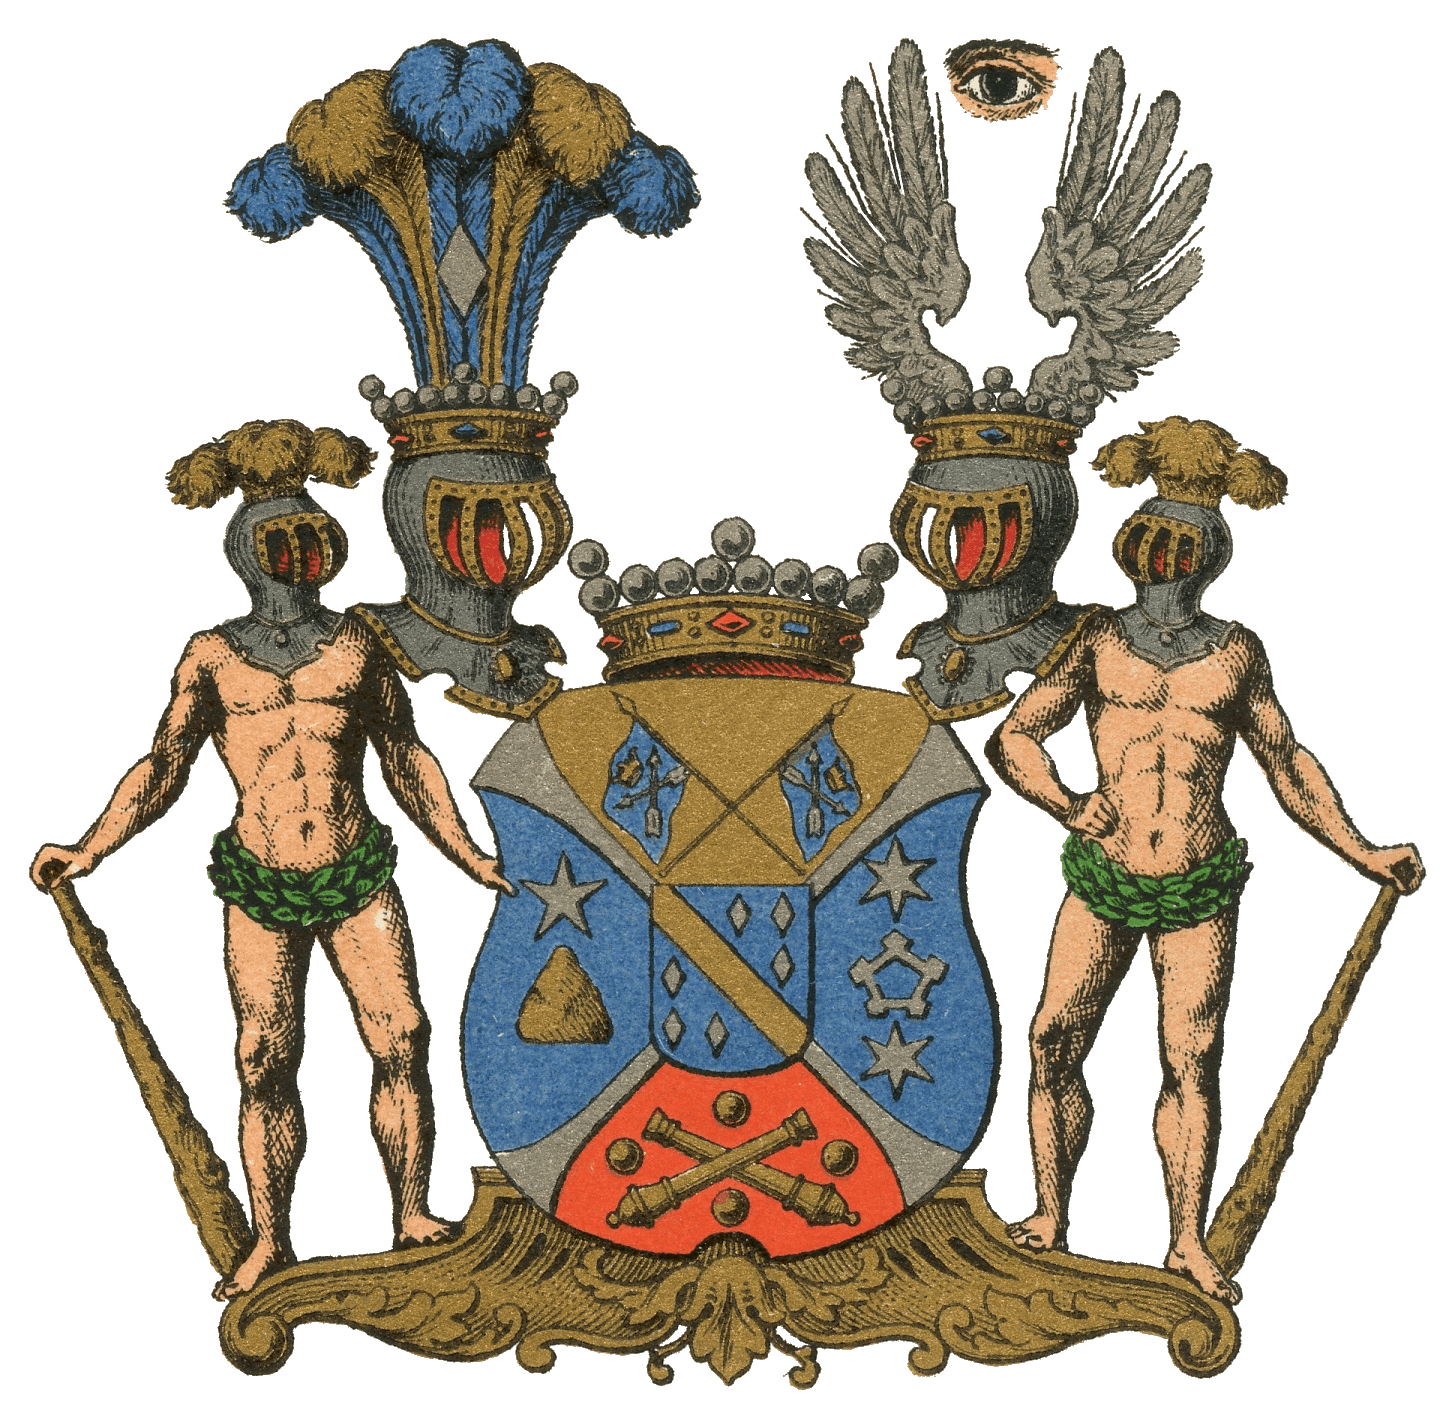 Файл:Mannerheim-vapaaherrasuvun vaakuna.PNG